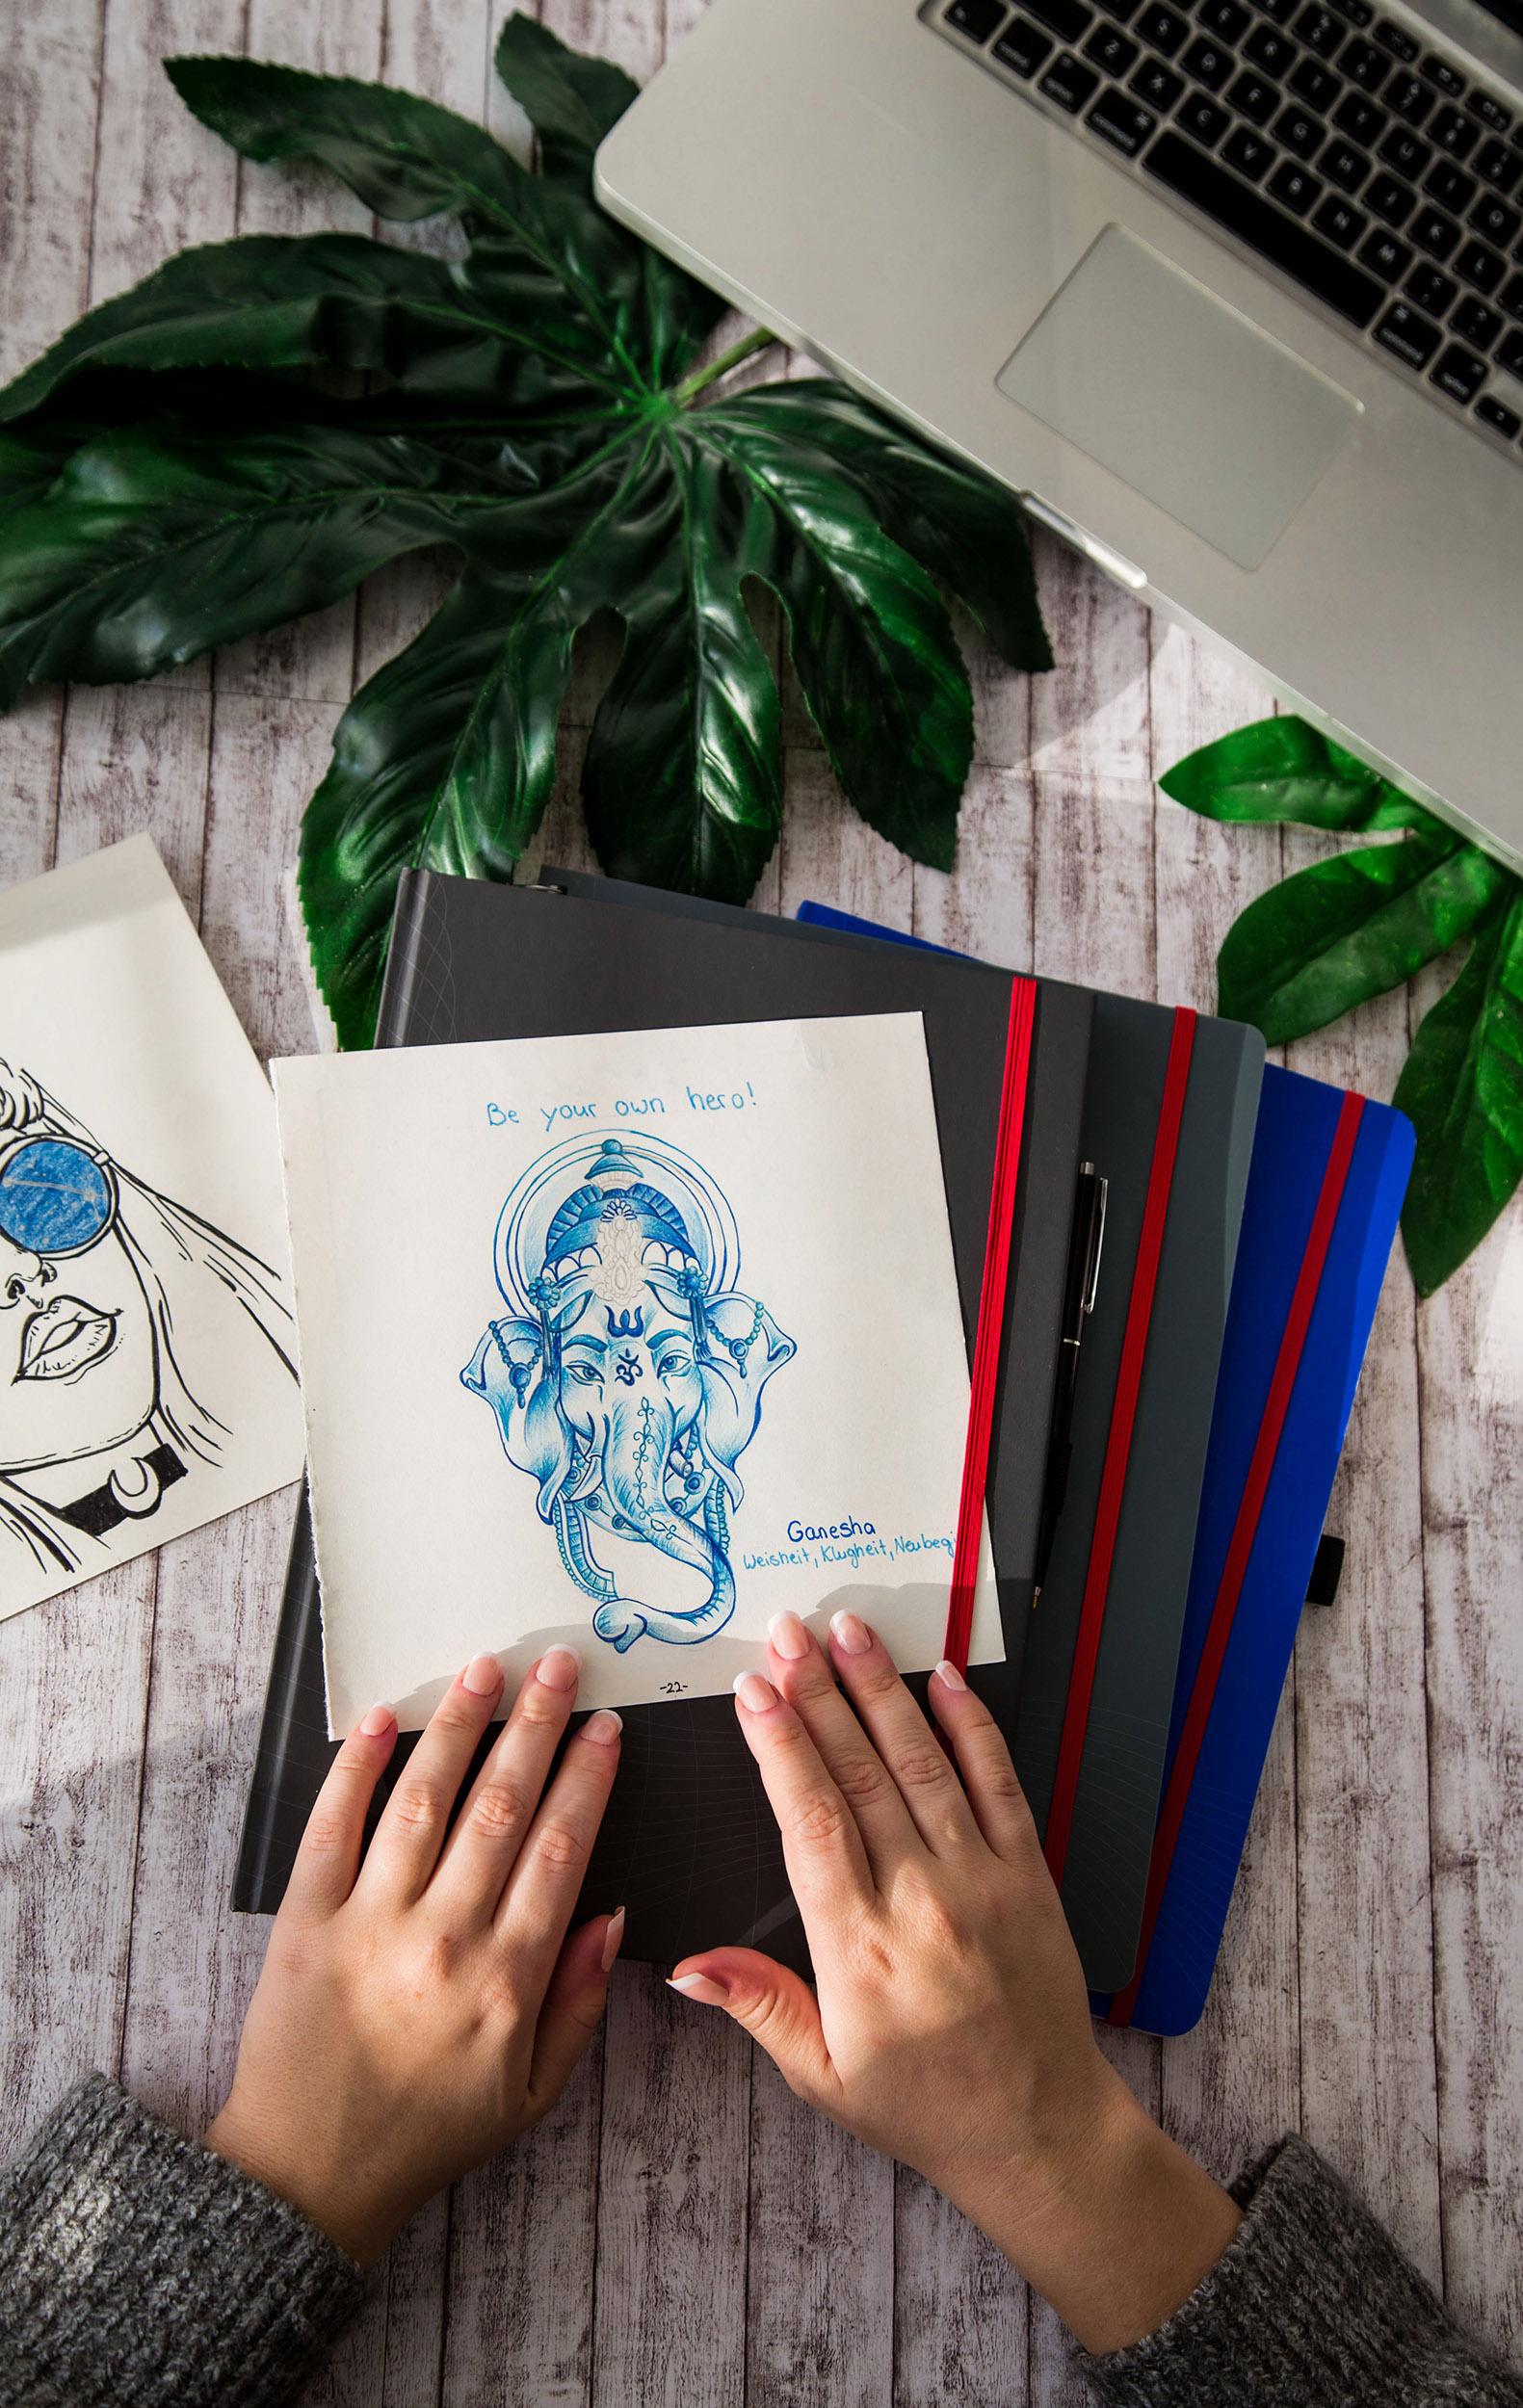 Amely Rose fashionblogger Notizio Avery Zweckform Bulletjournal Bujo Planer Kalender 2018